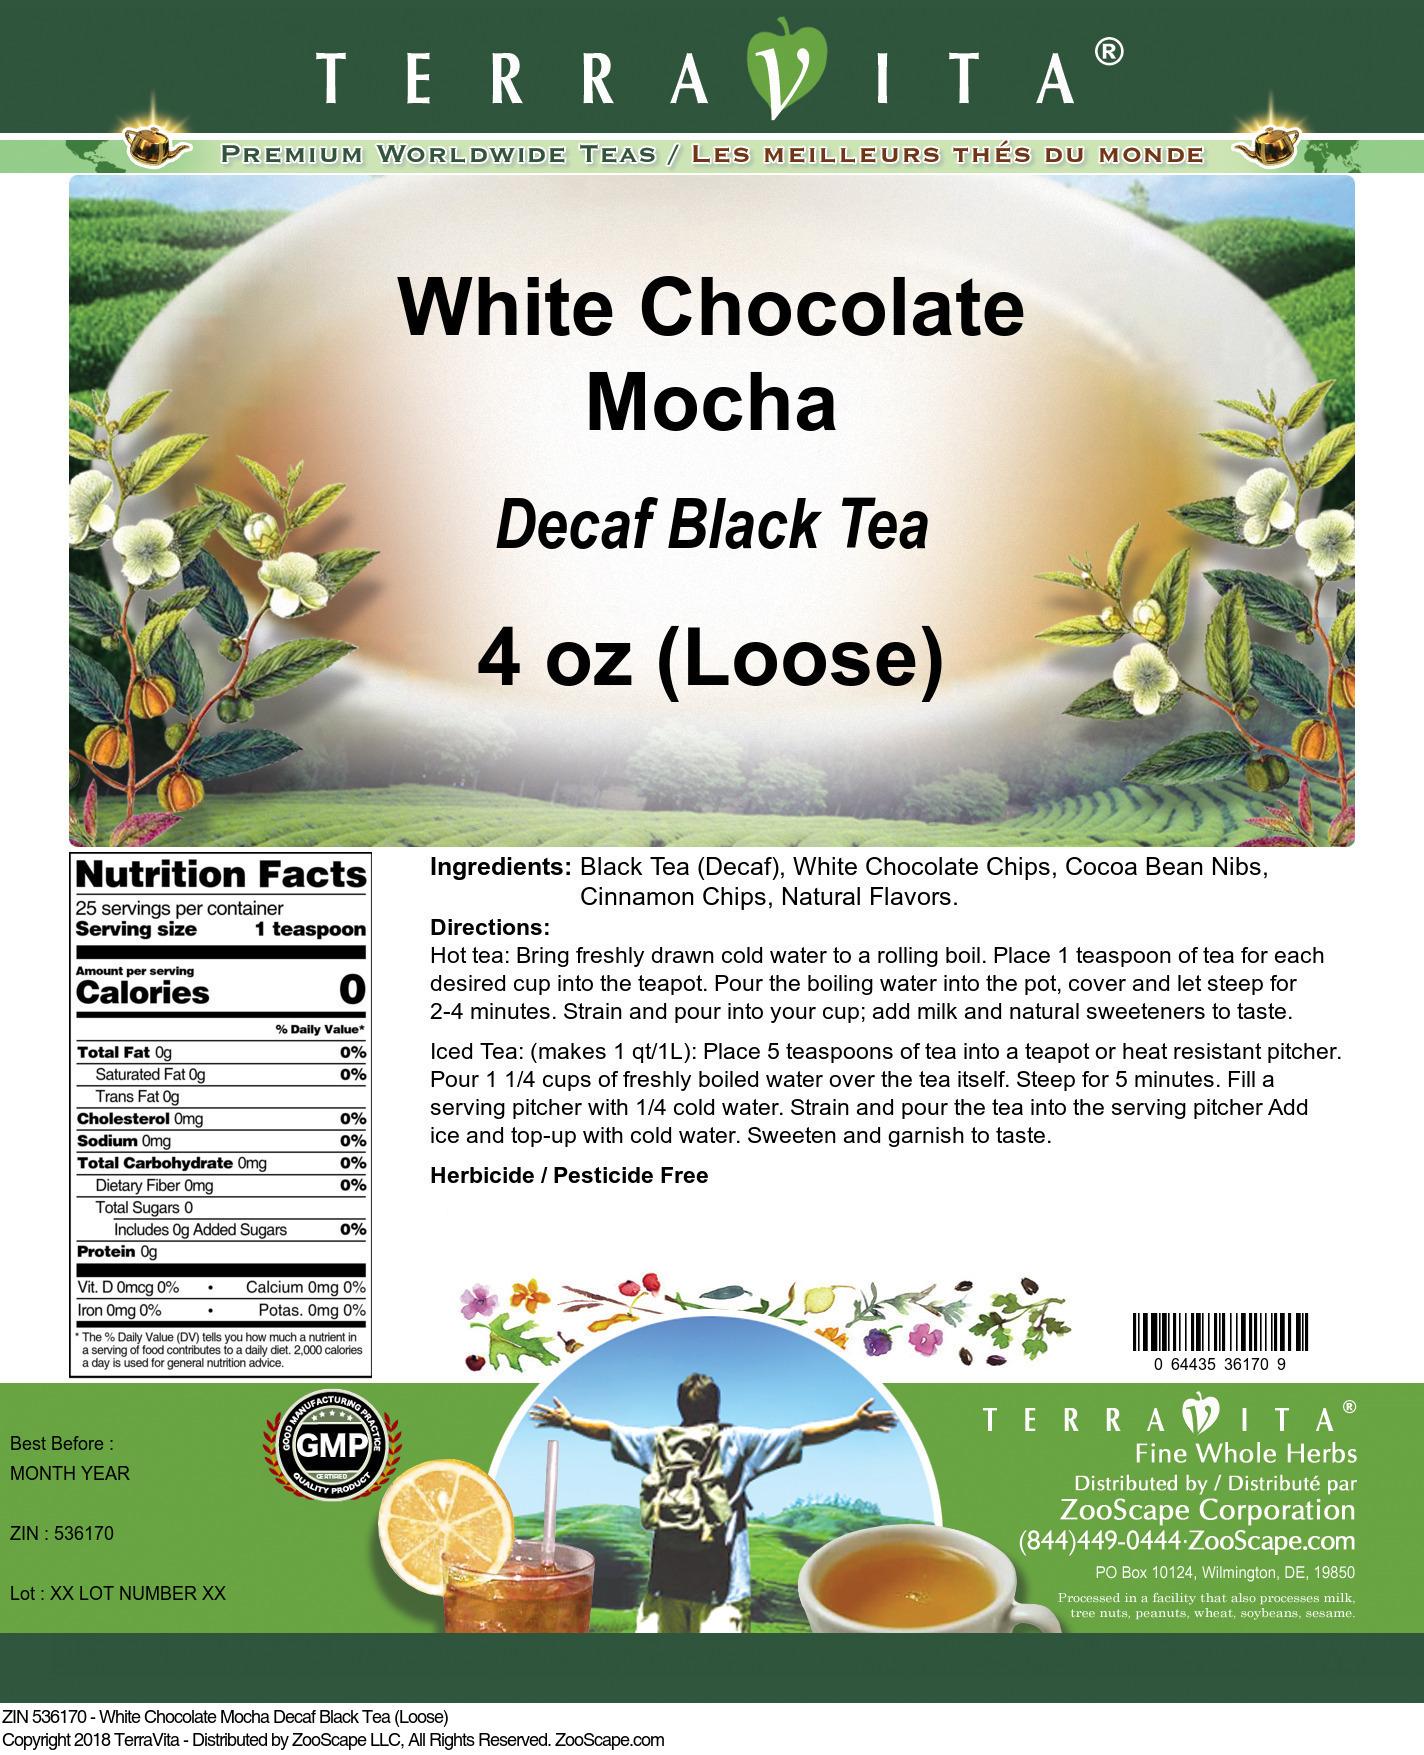 White Chocolate Mocha Decaf Black Tea